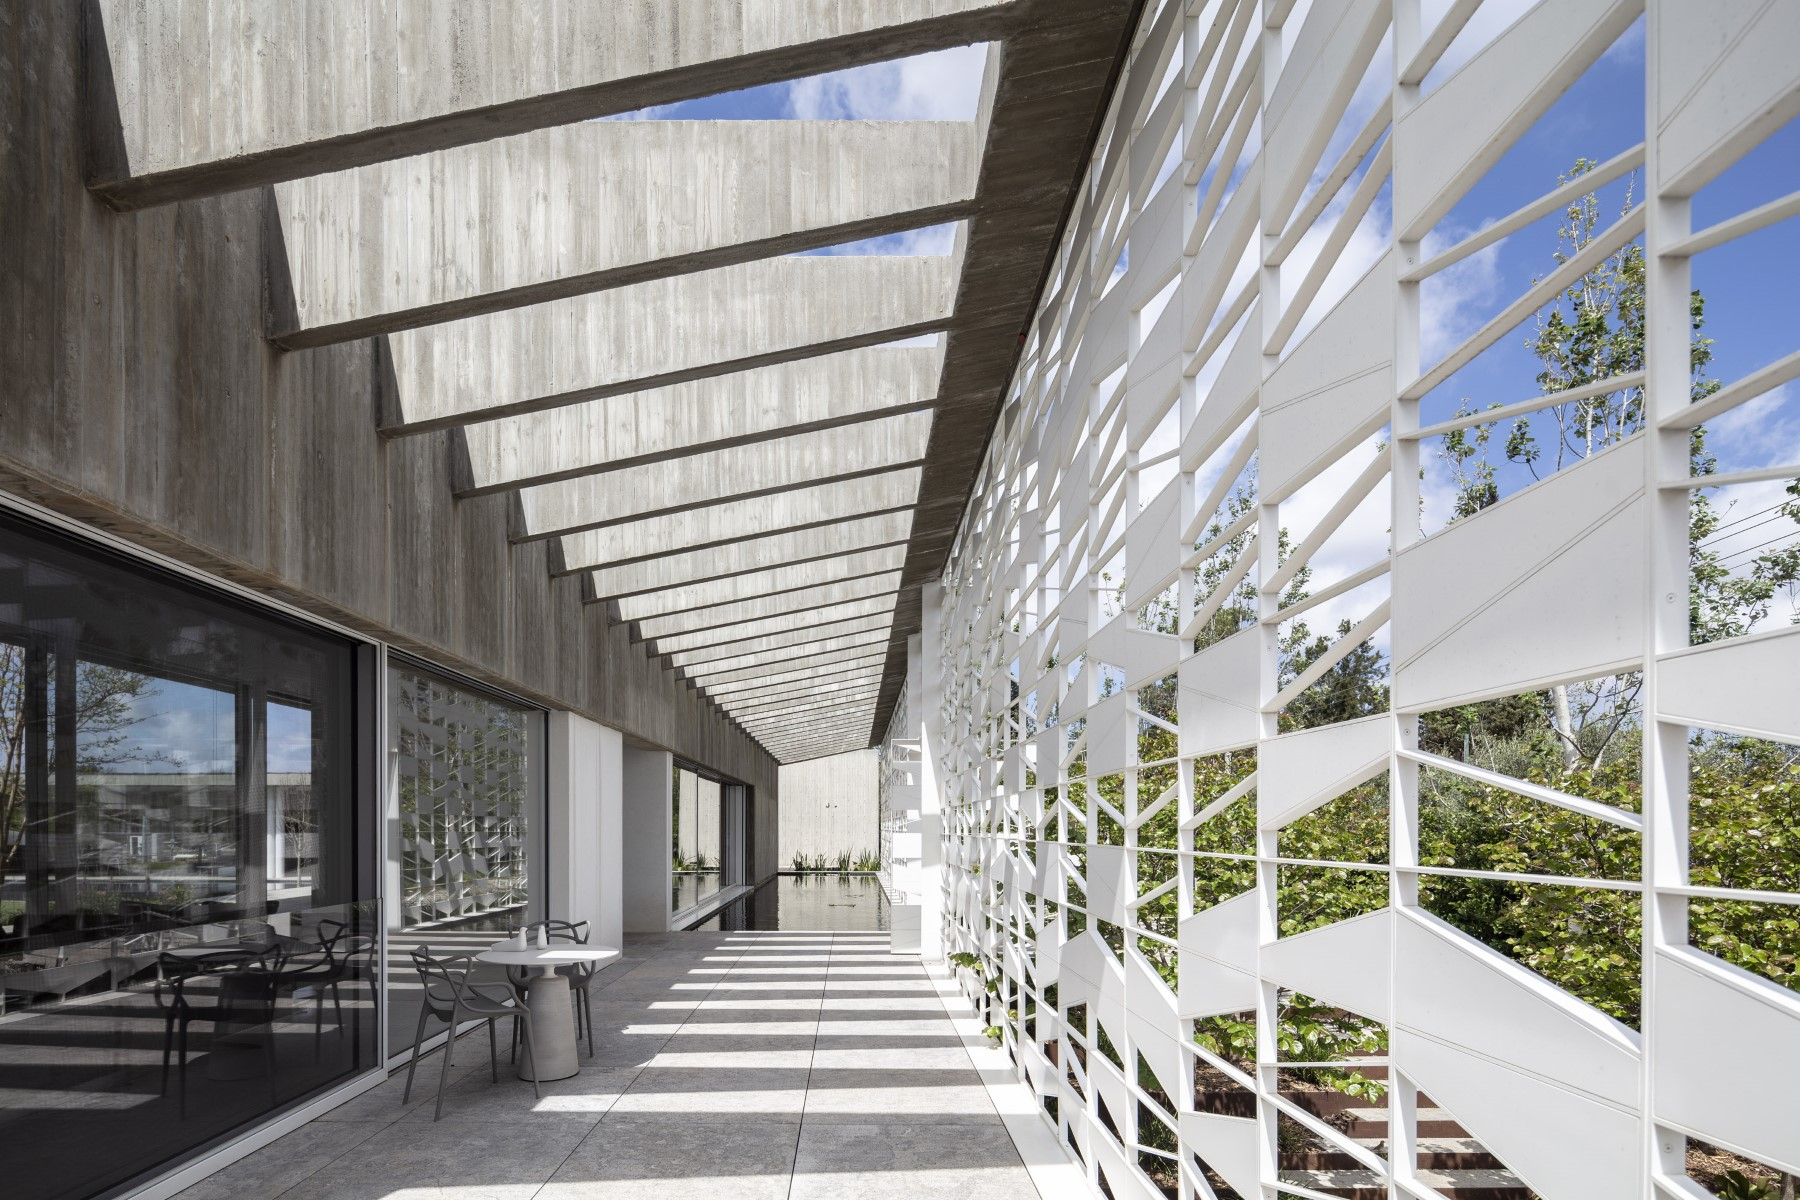 Residential perforated metal